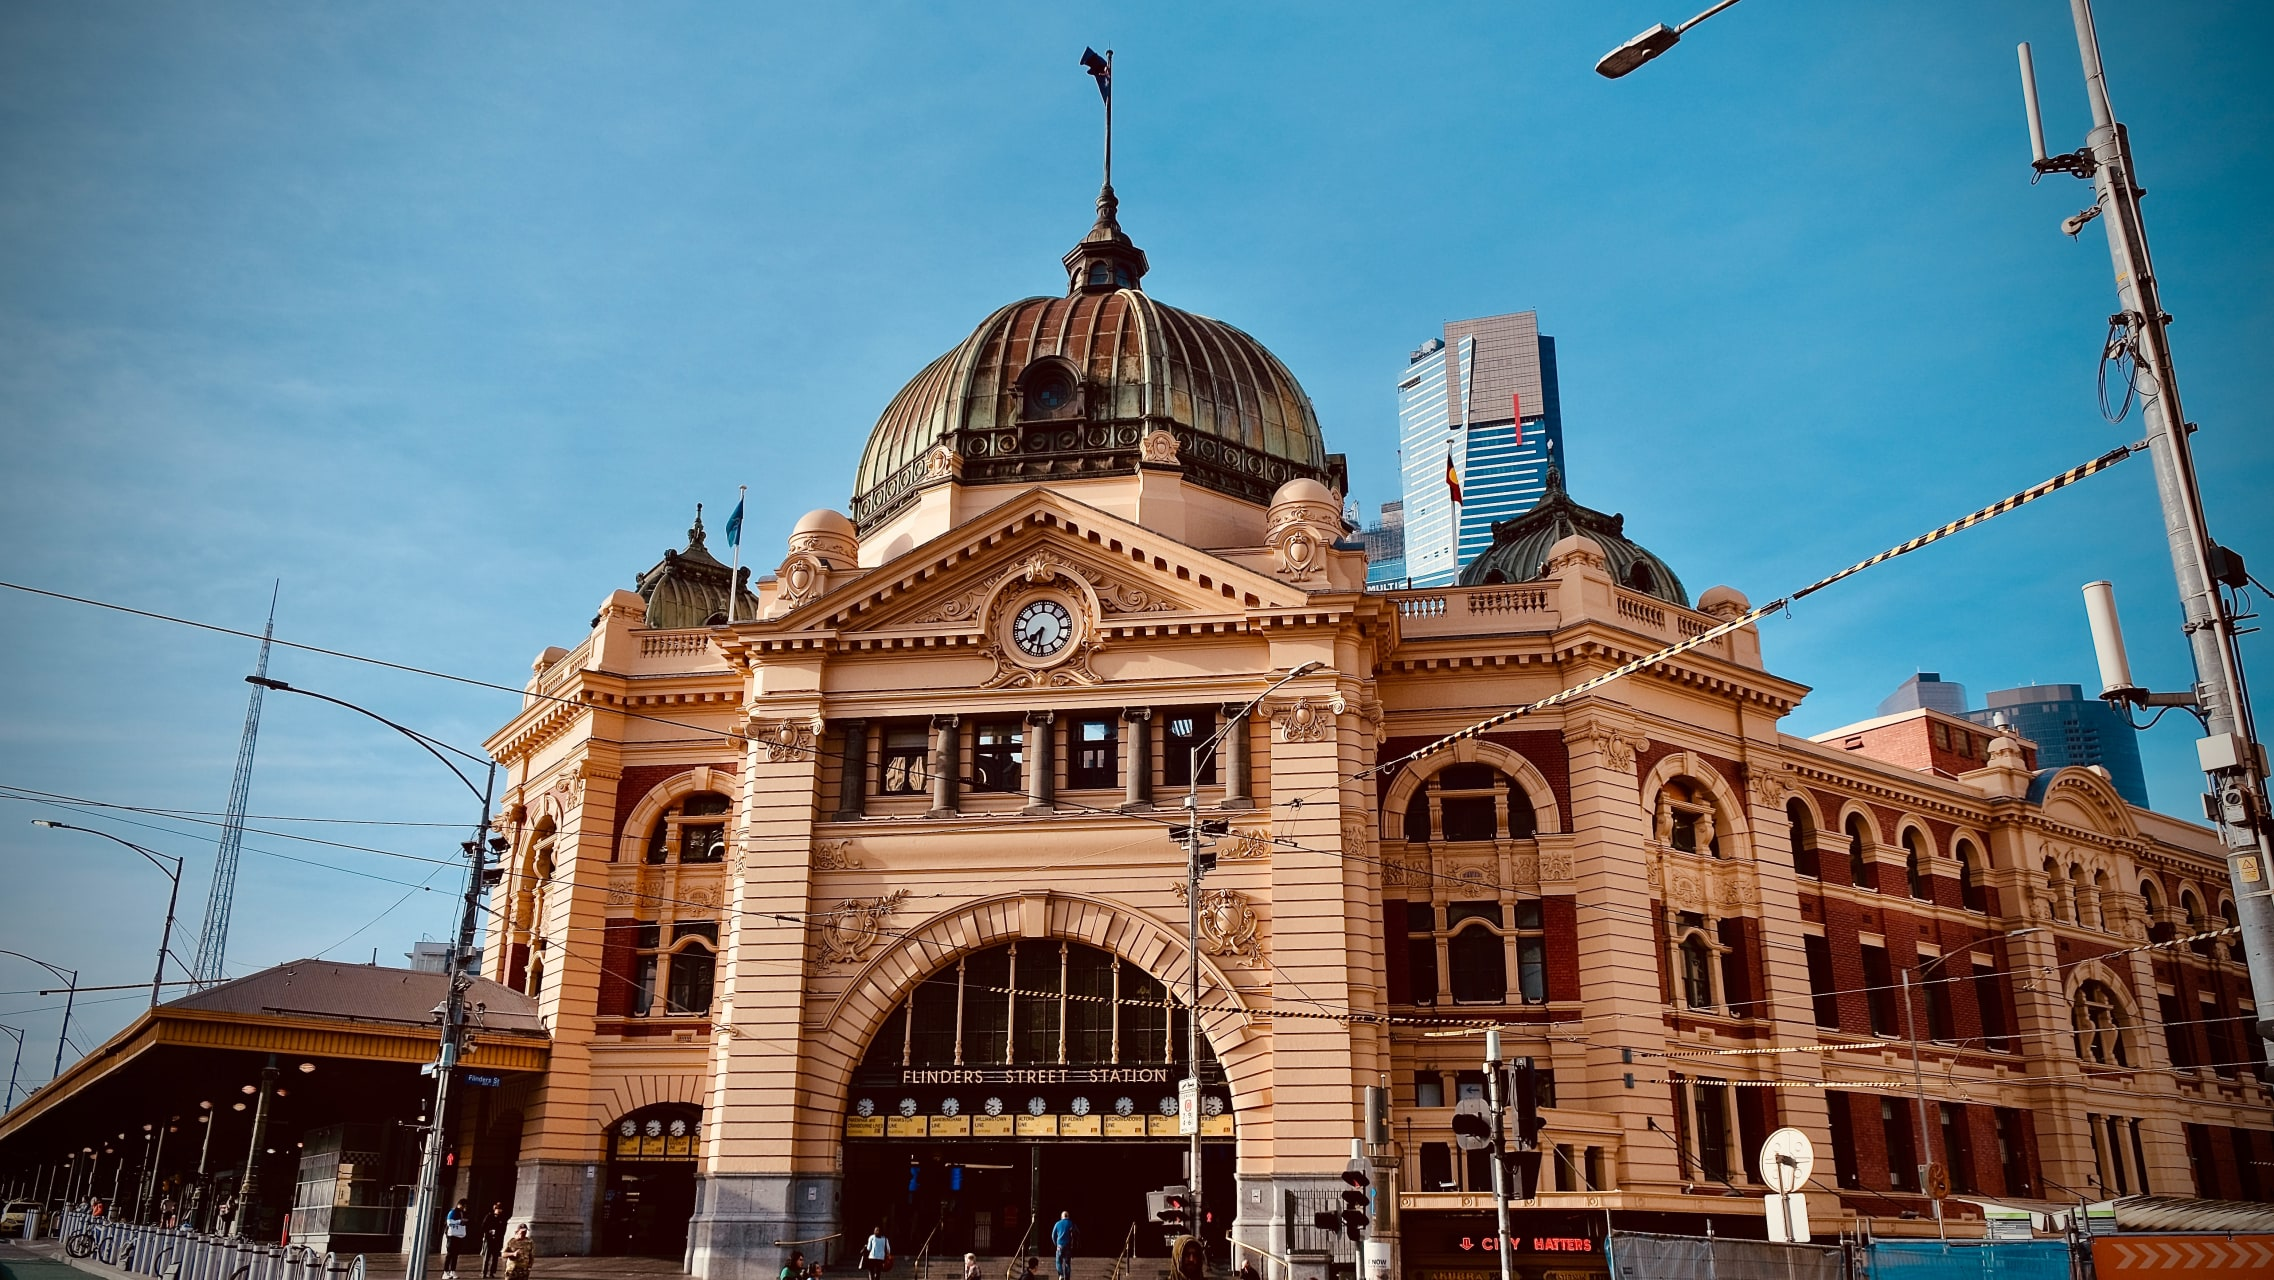 Melbourne - City Sights of Melbourne